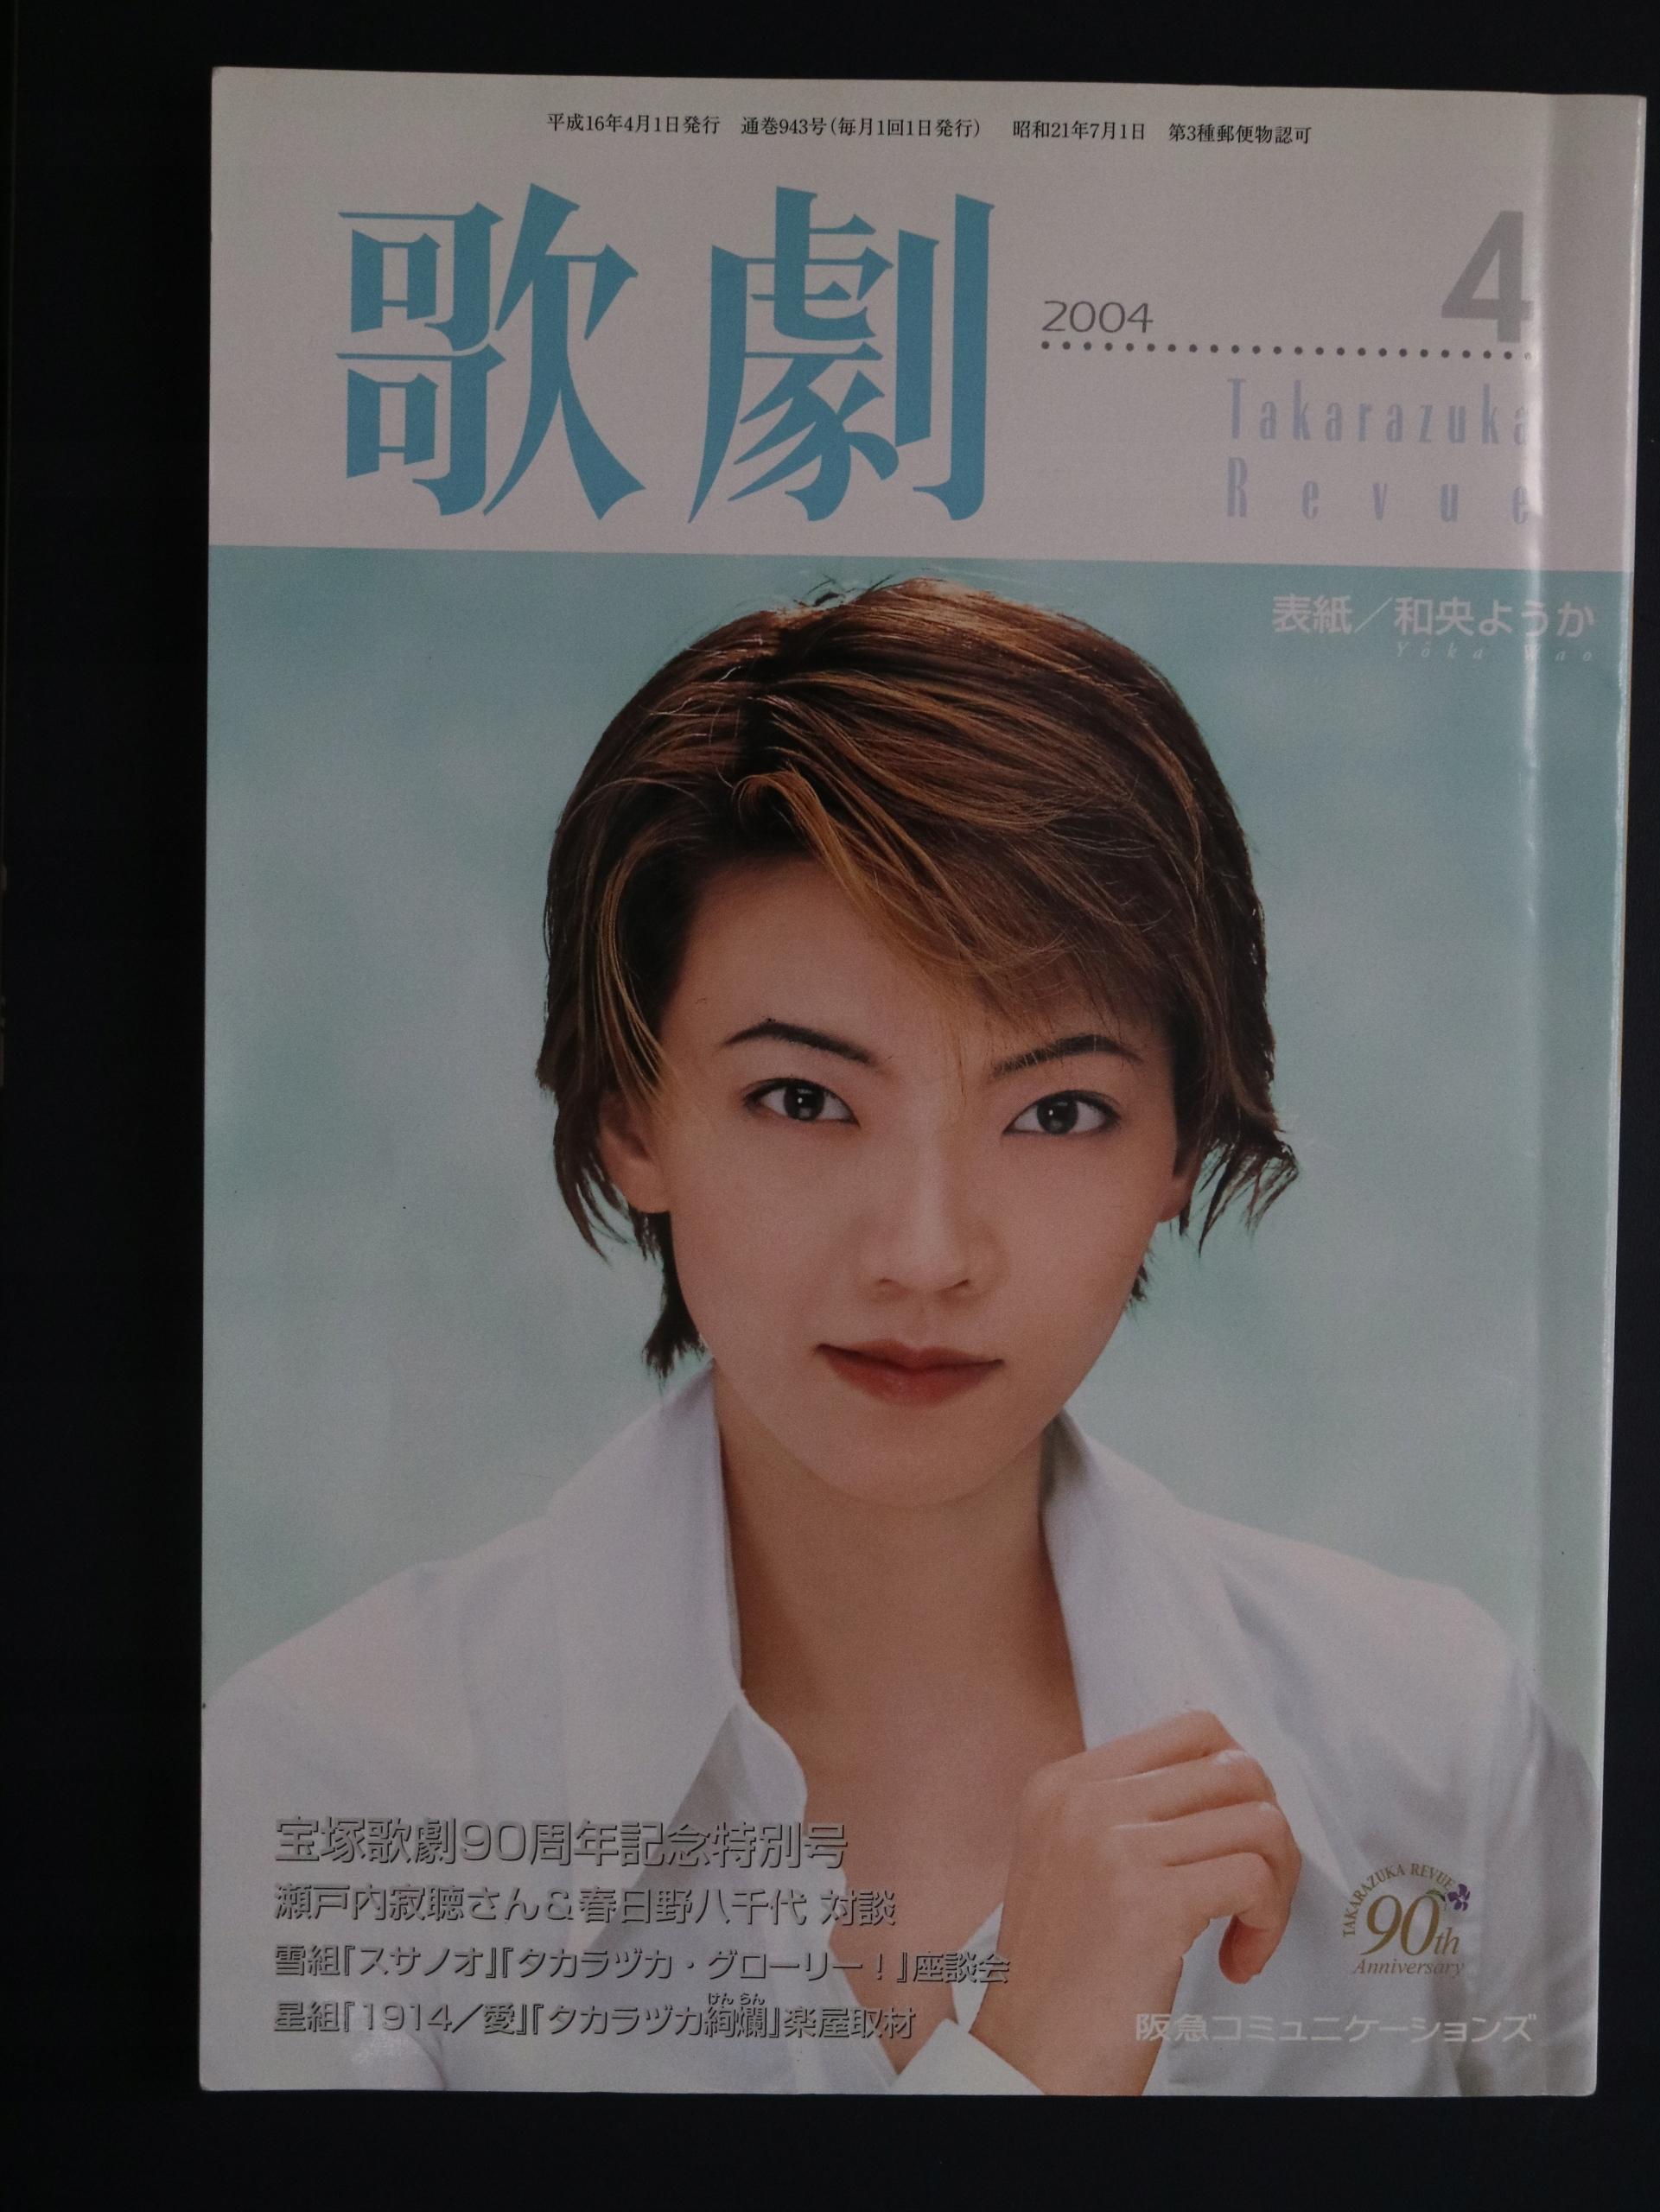 KAGEKI czasopismo o Takarazuka Revue 12/2004